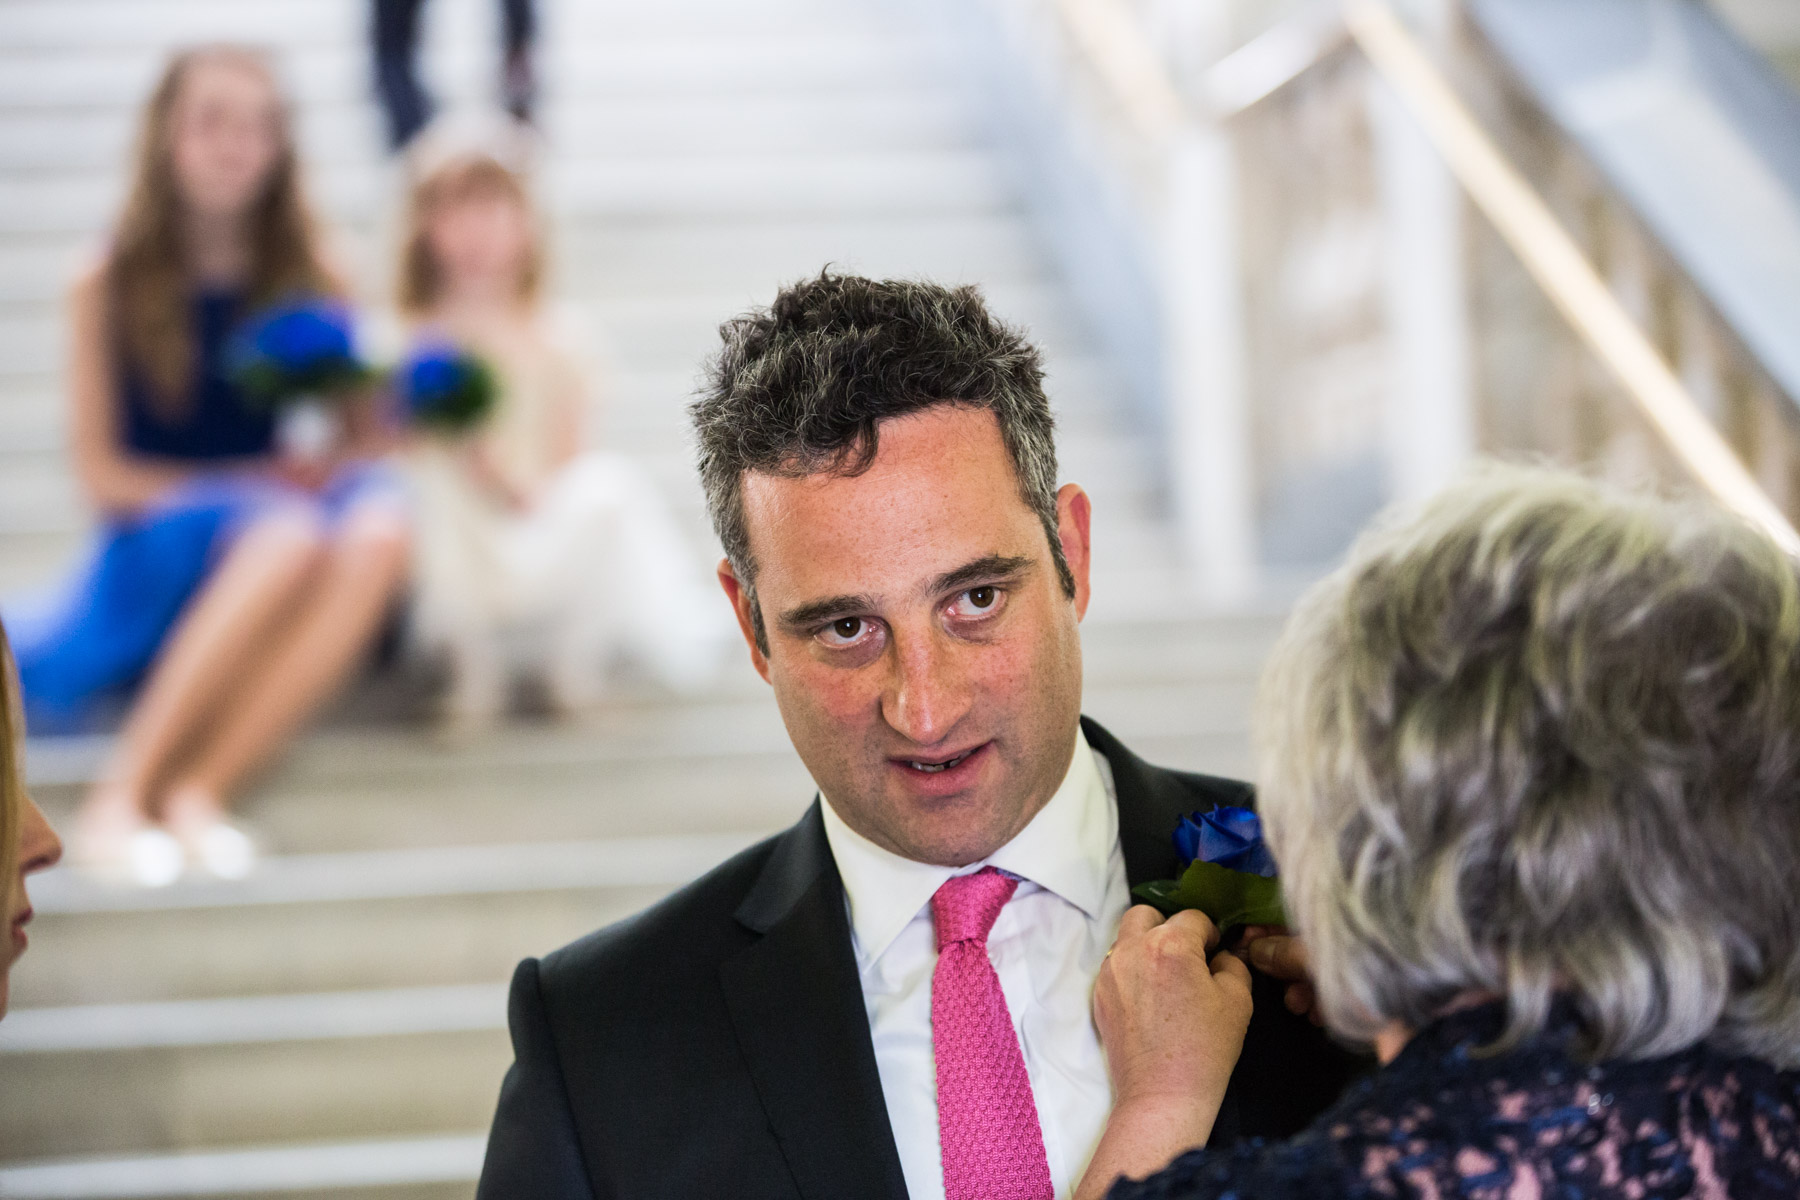 Islington Town Hall Wedding Photography - Richard Murgatroyd